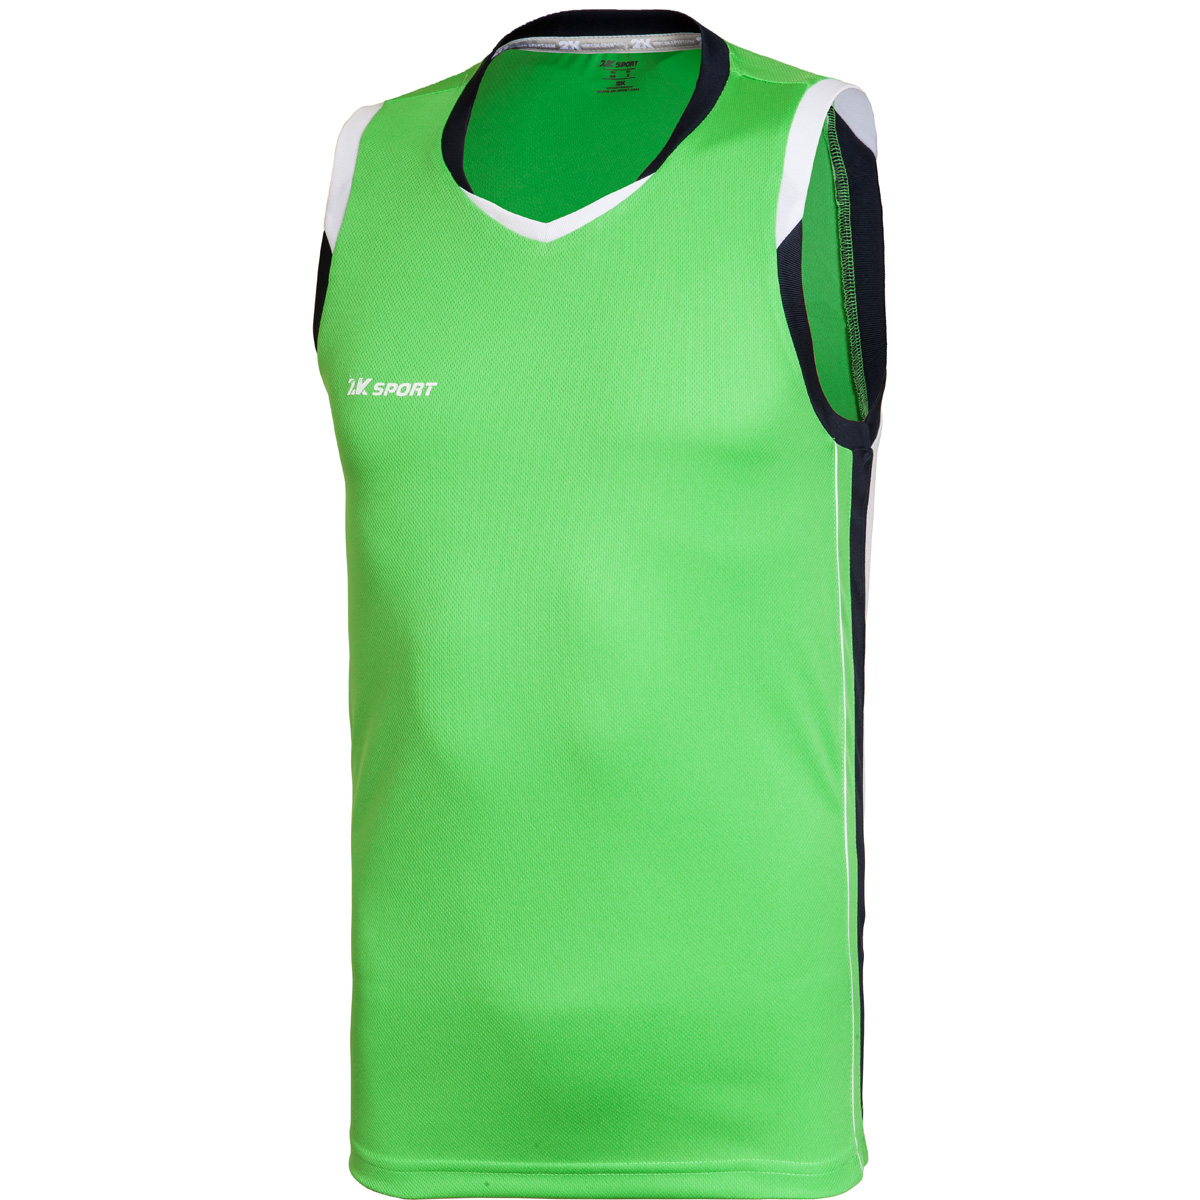 Майка баскетбольная мужская 2K Sport Advance, цвет: светло-зеленый, темно-синий, белый. 130030. Размер XXXL (56) - Баскетбол